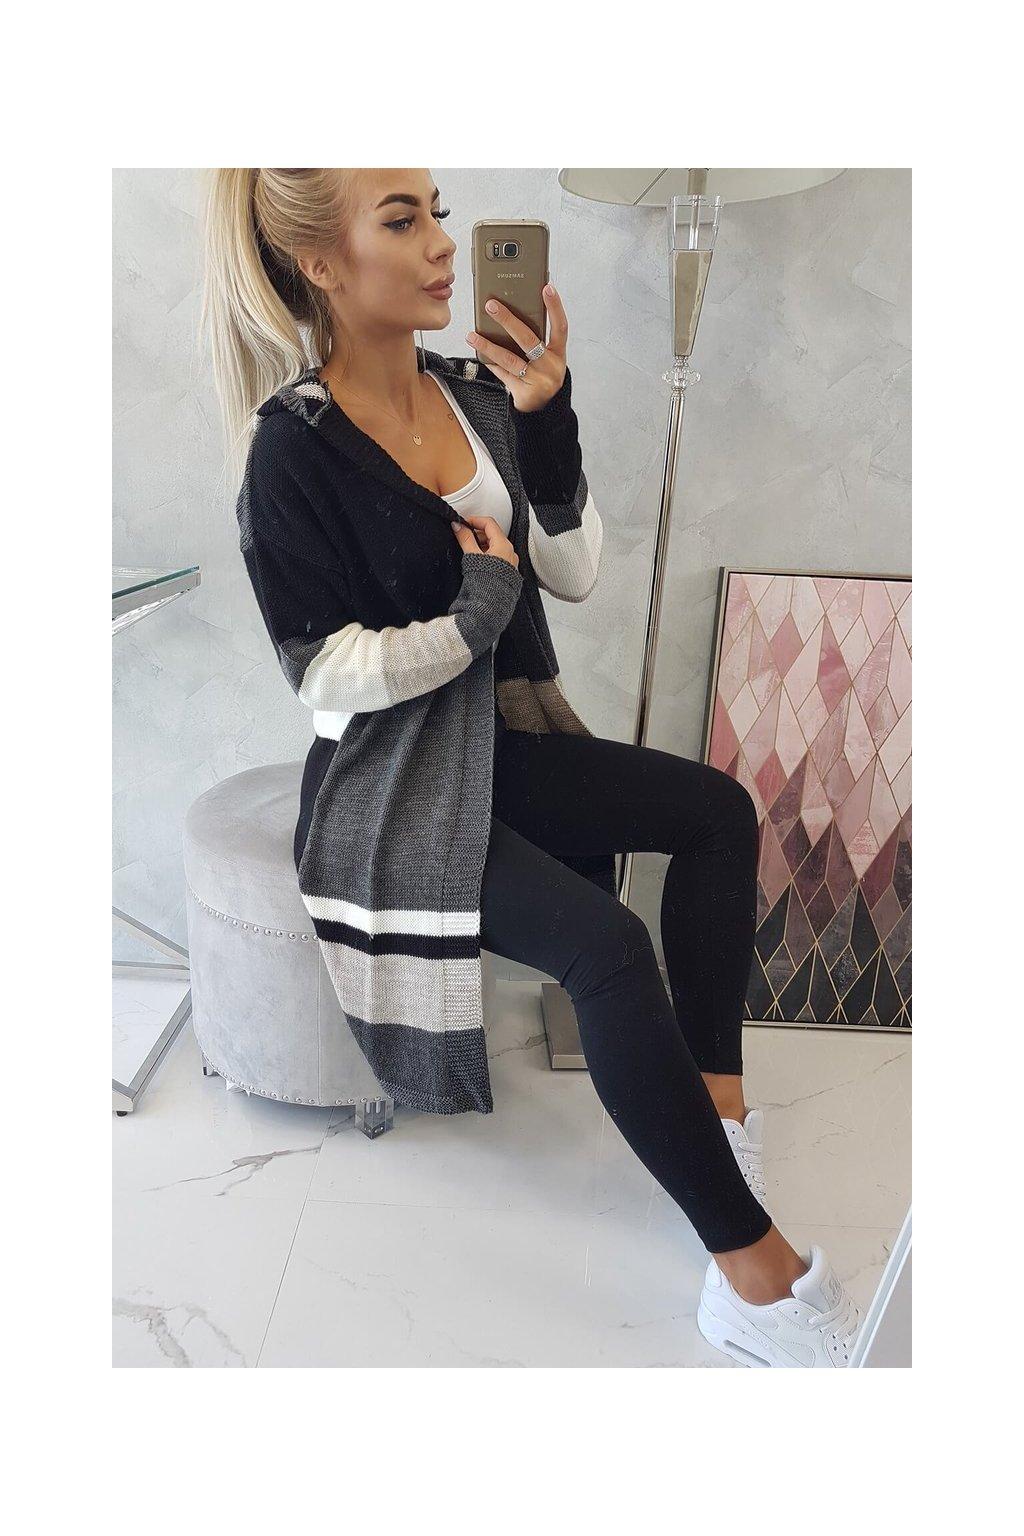 eng pl Four color striped sweater graphite beige black 18295 7